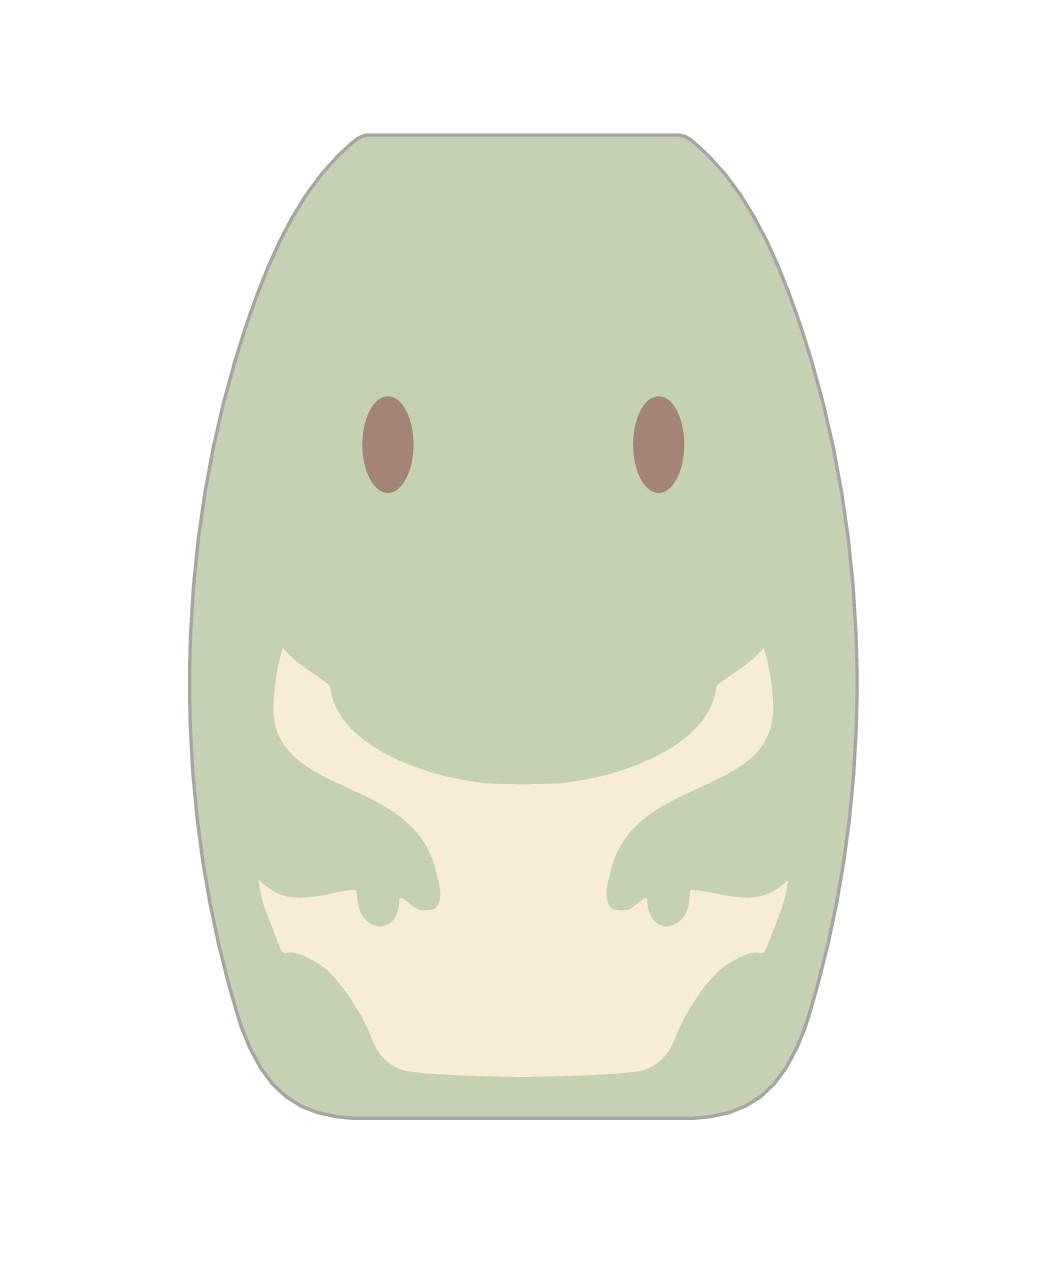 2D Kids Character Design